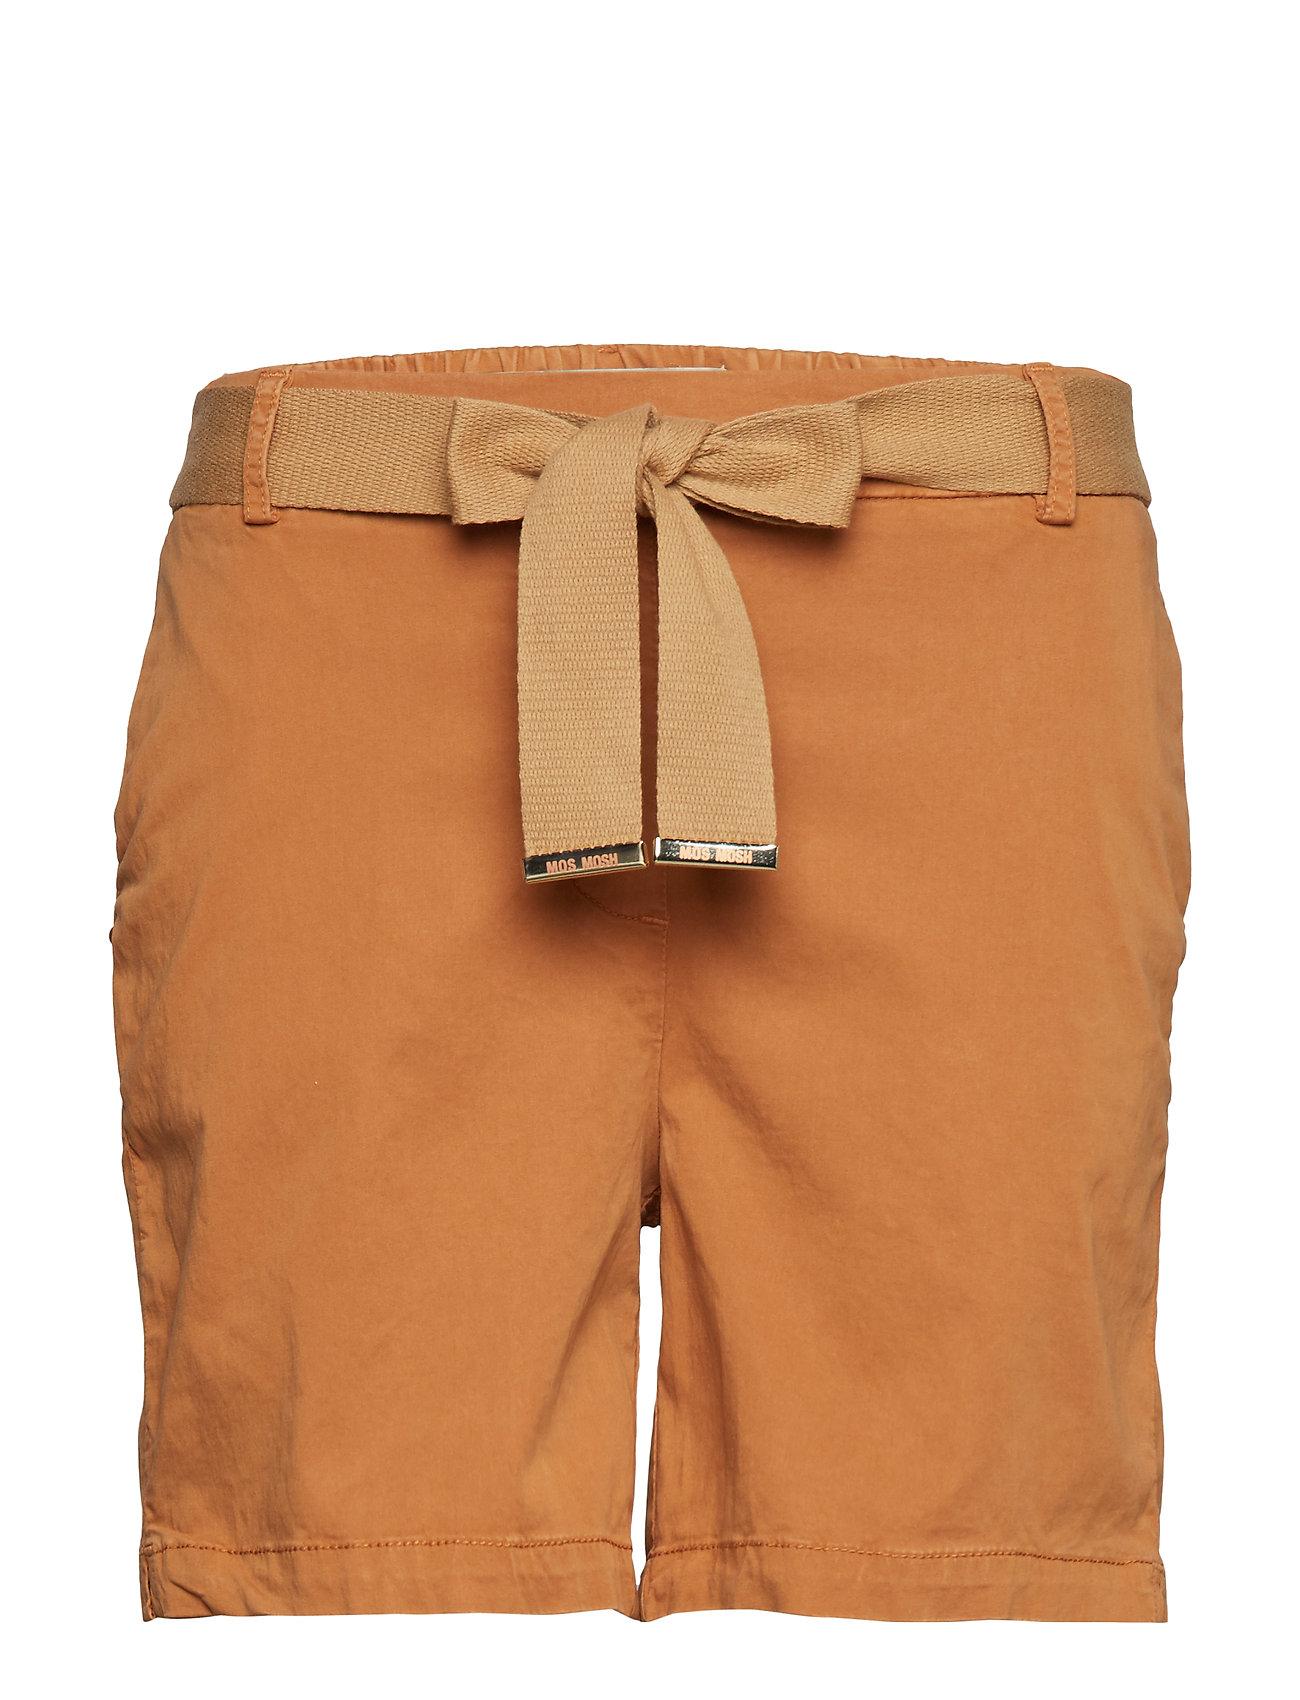 MOS MOSH Penton Shorts - CASHEW